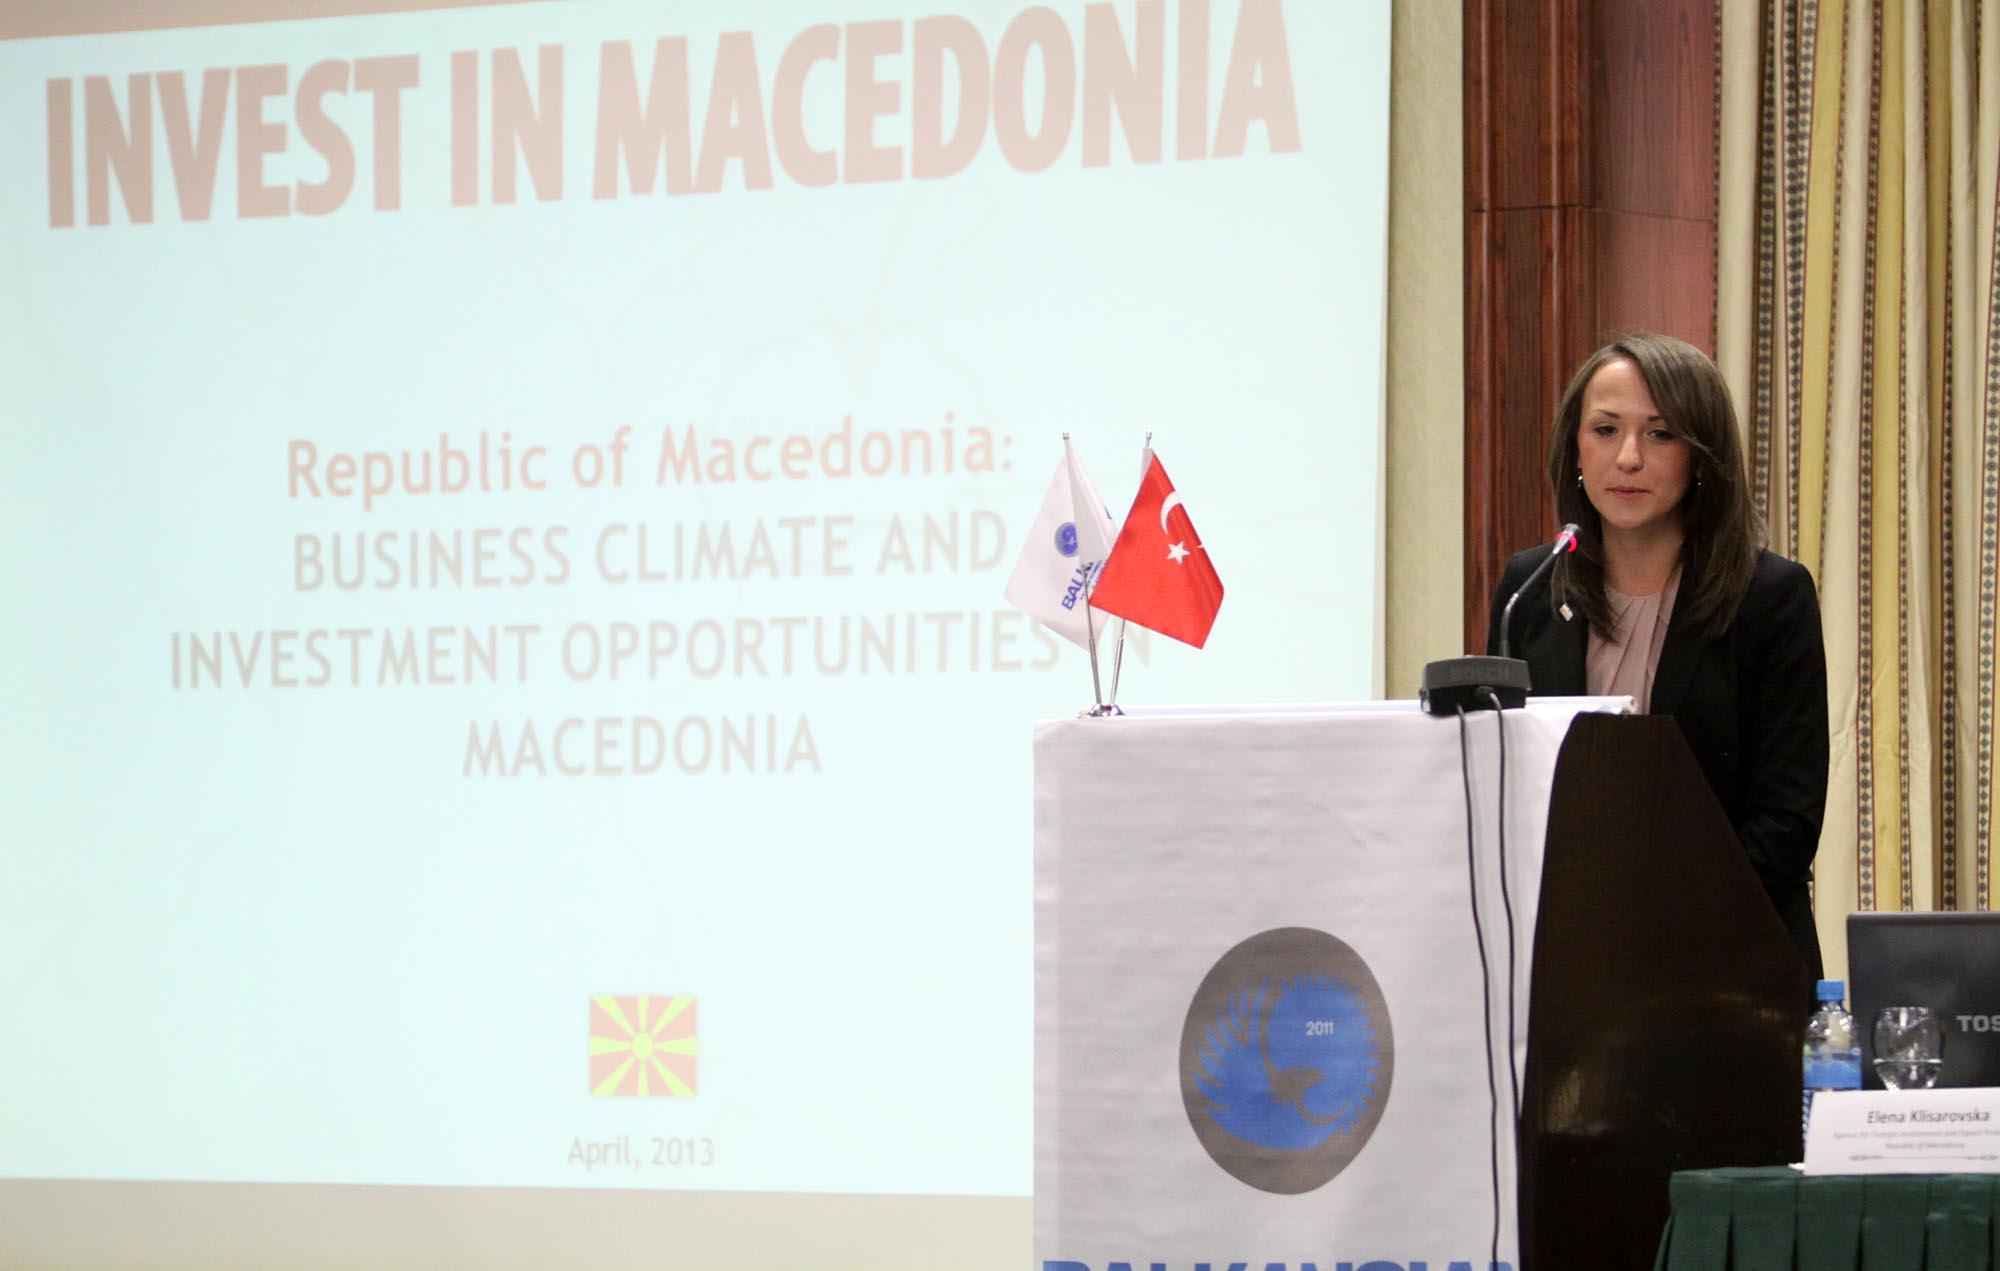 Turkish investor interested in Former Yugoslav Republic of Macedonia